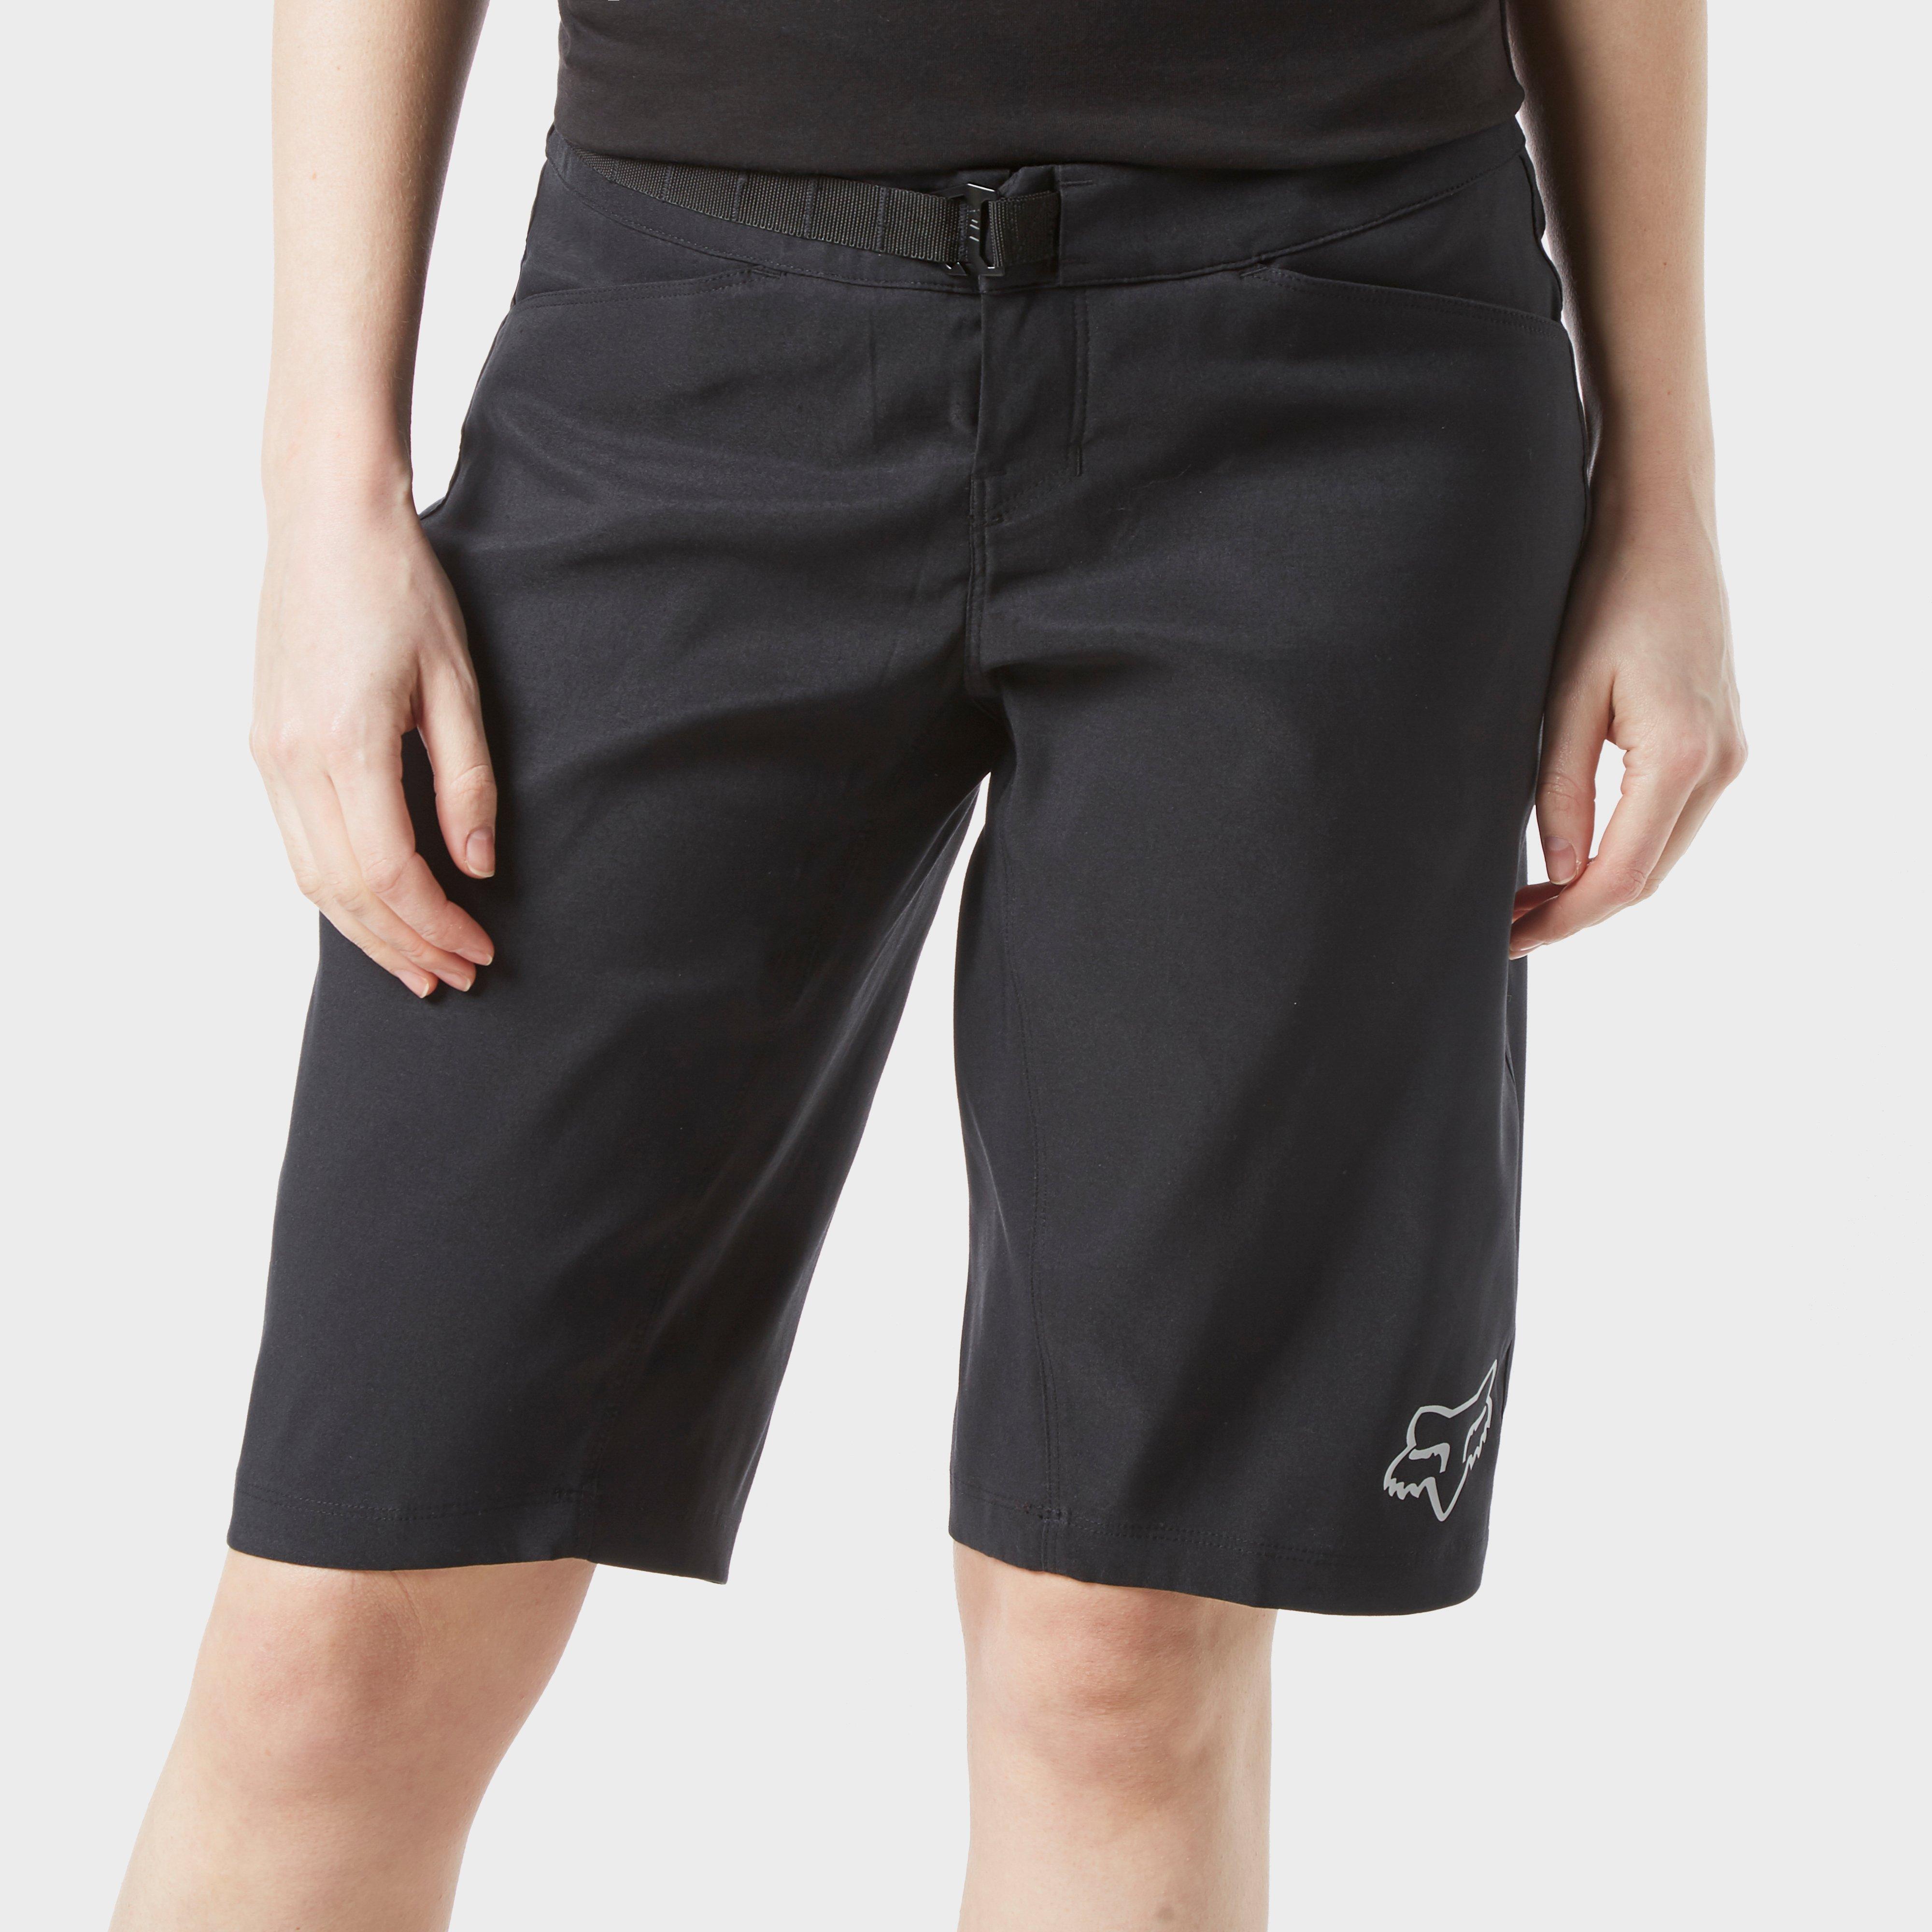 FOX Fox Womens Ranger Mountain Biker Shorts - Black, Black